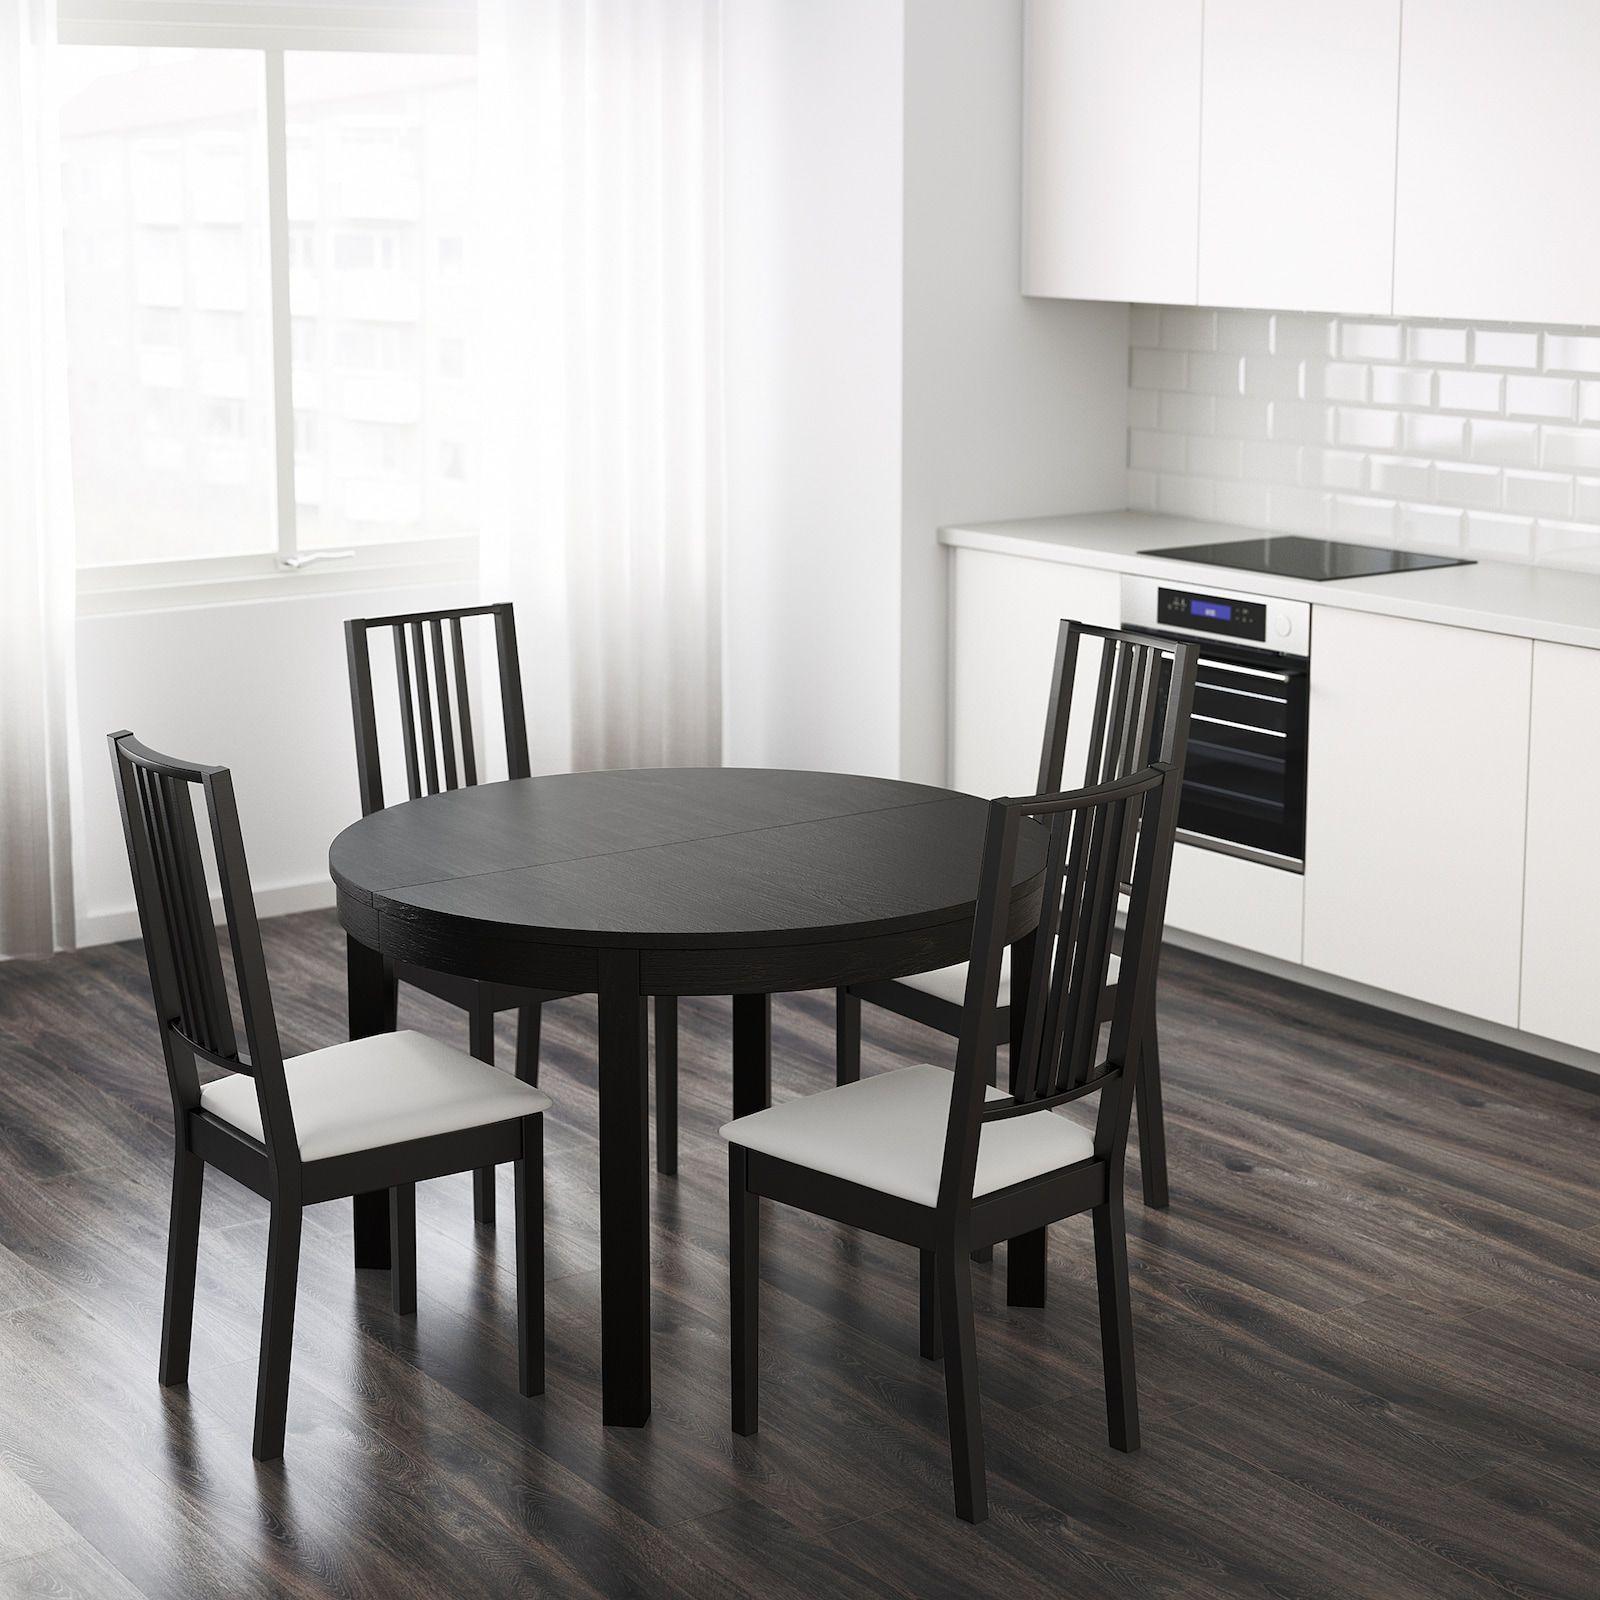 Bjursta Extendable Table Brown Black Ikea Oformlenie Obedennogo Stola Kvartirnaya Mebel Idei